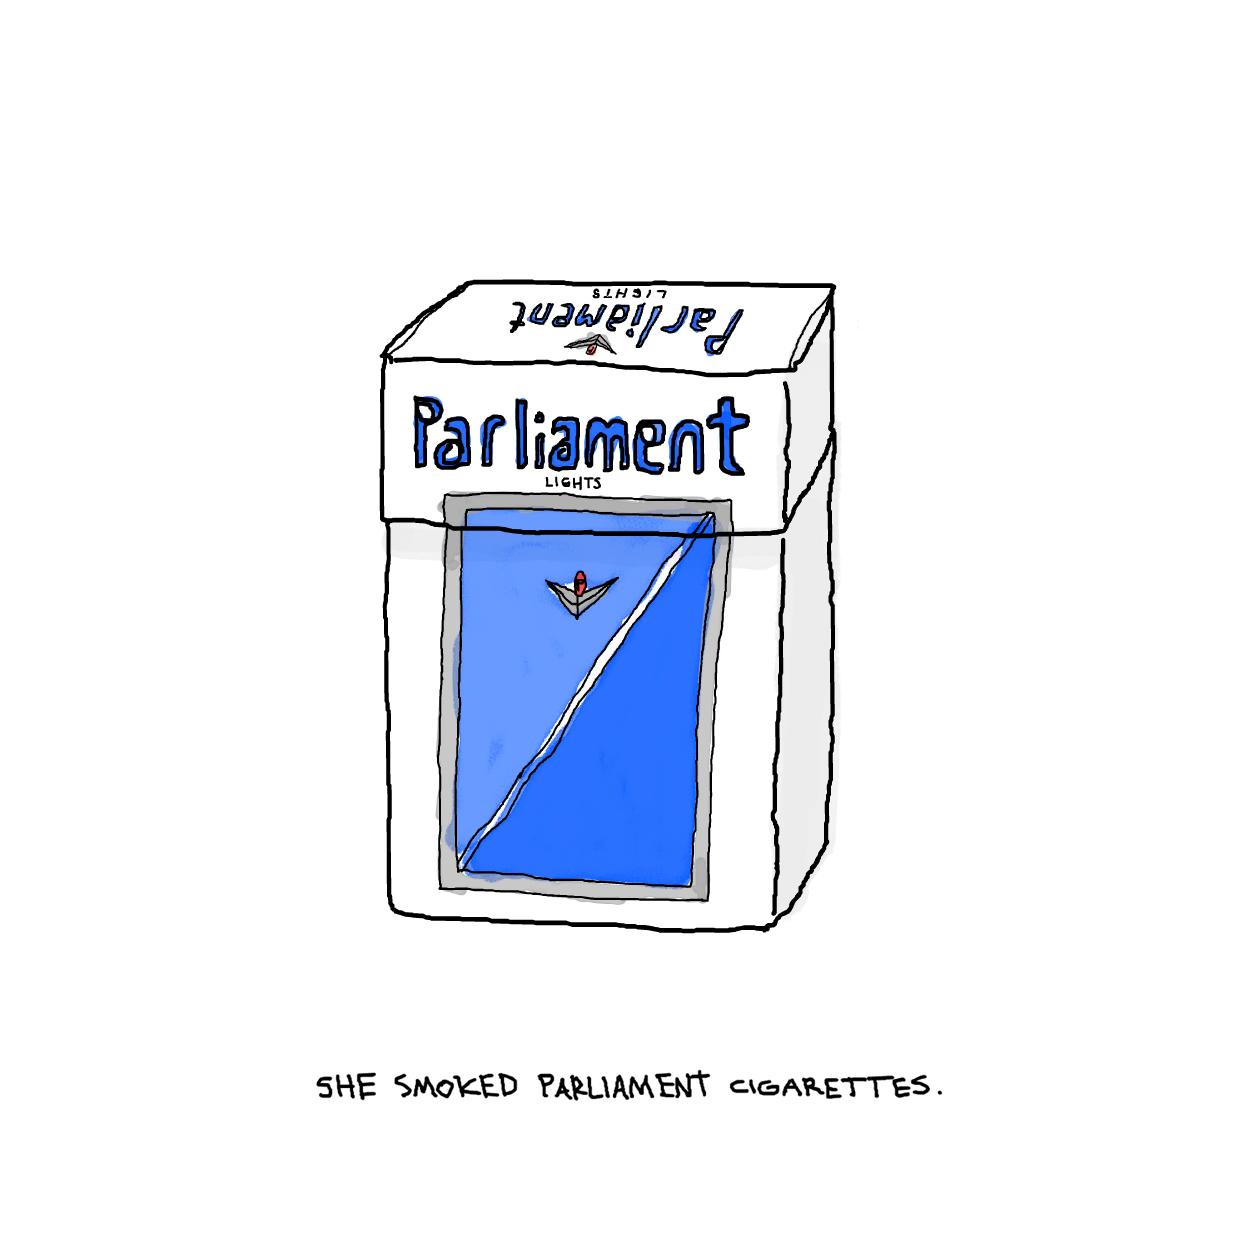 She smoked Parliament cigarettes.